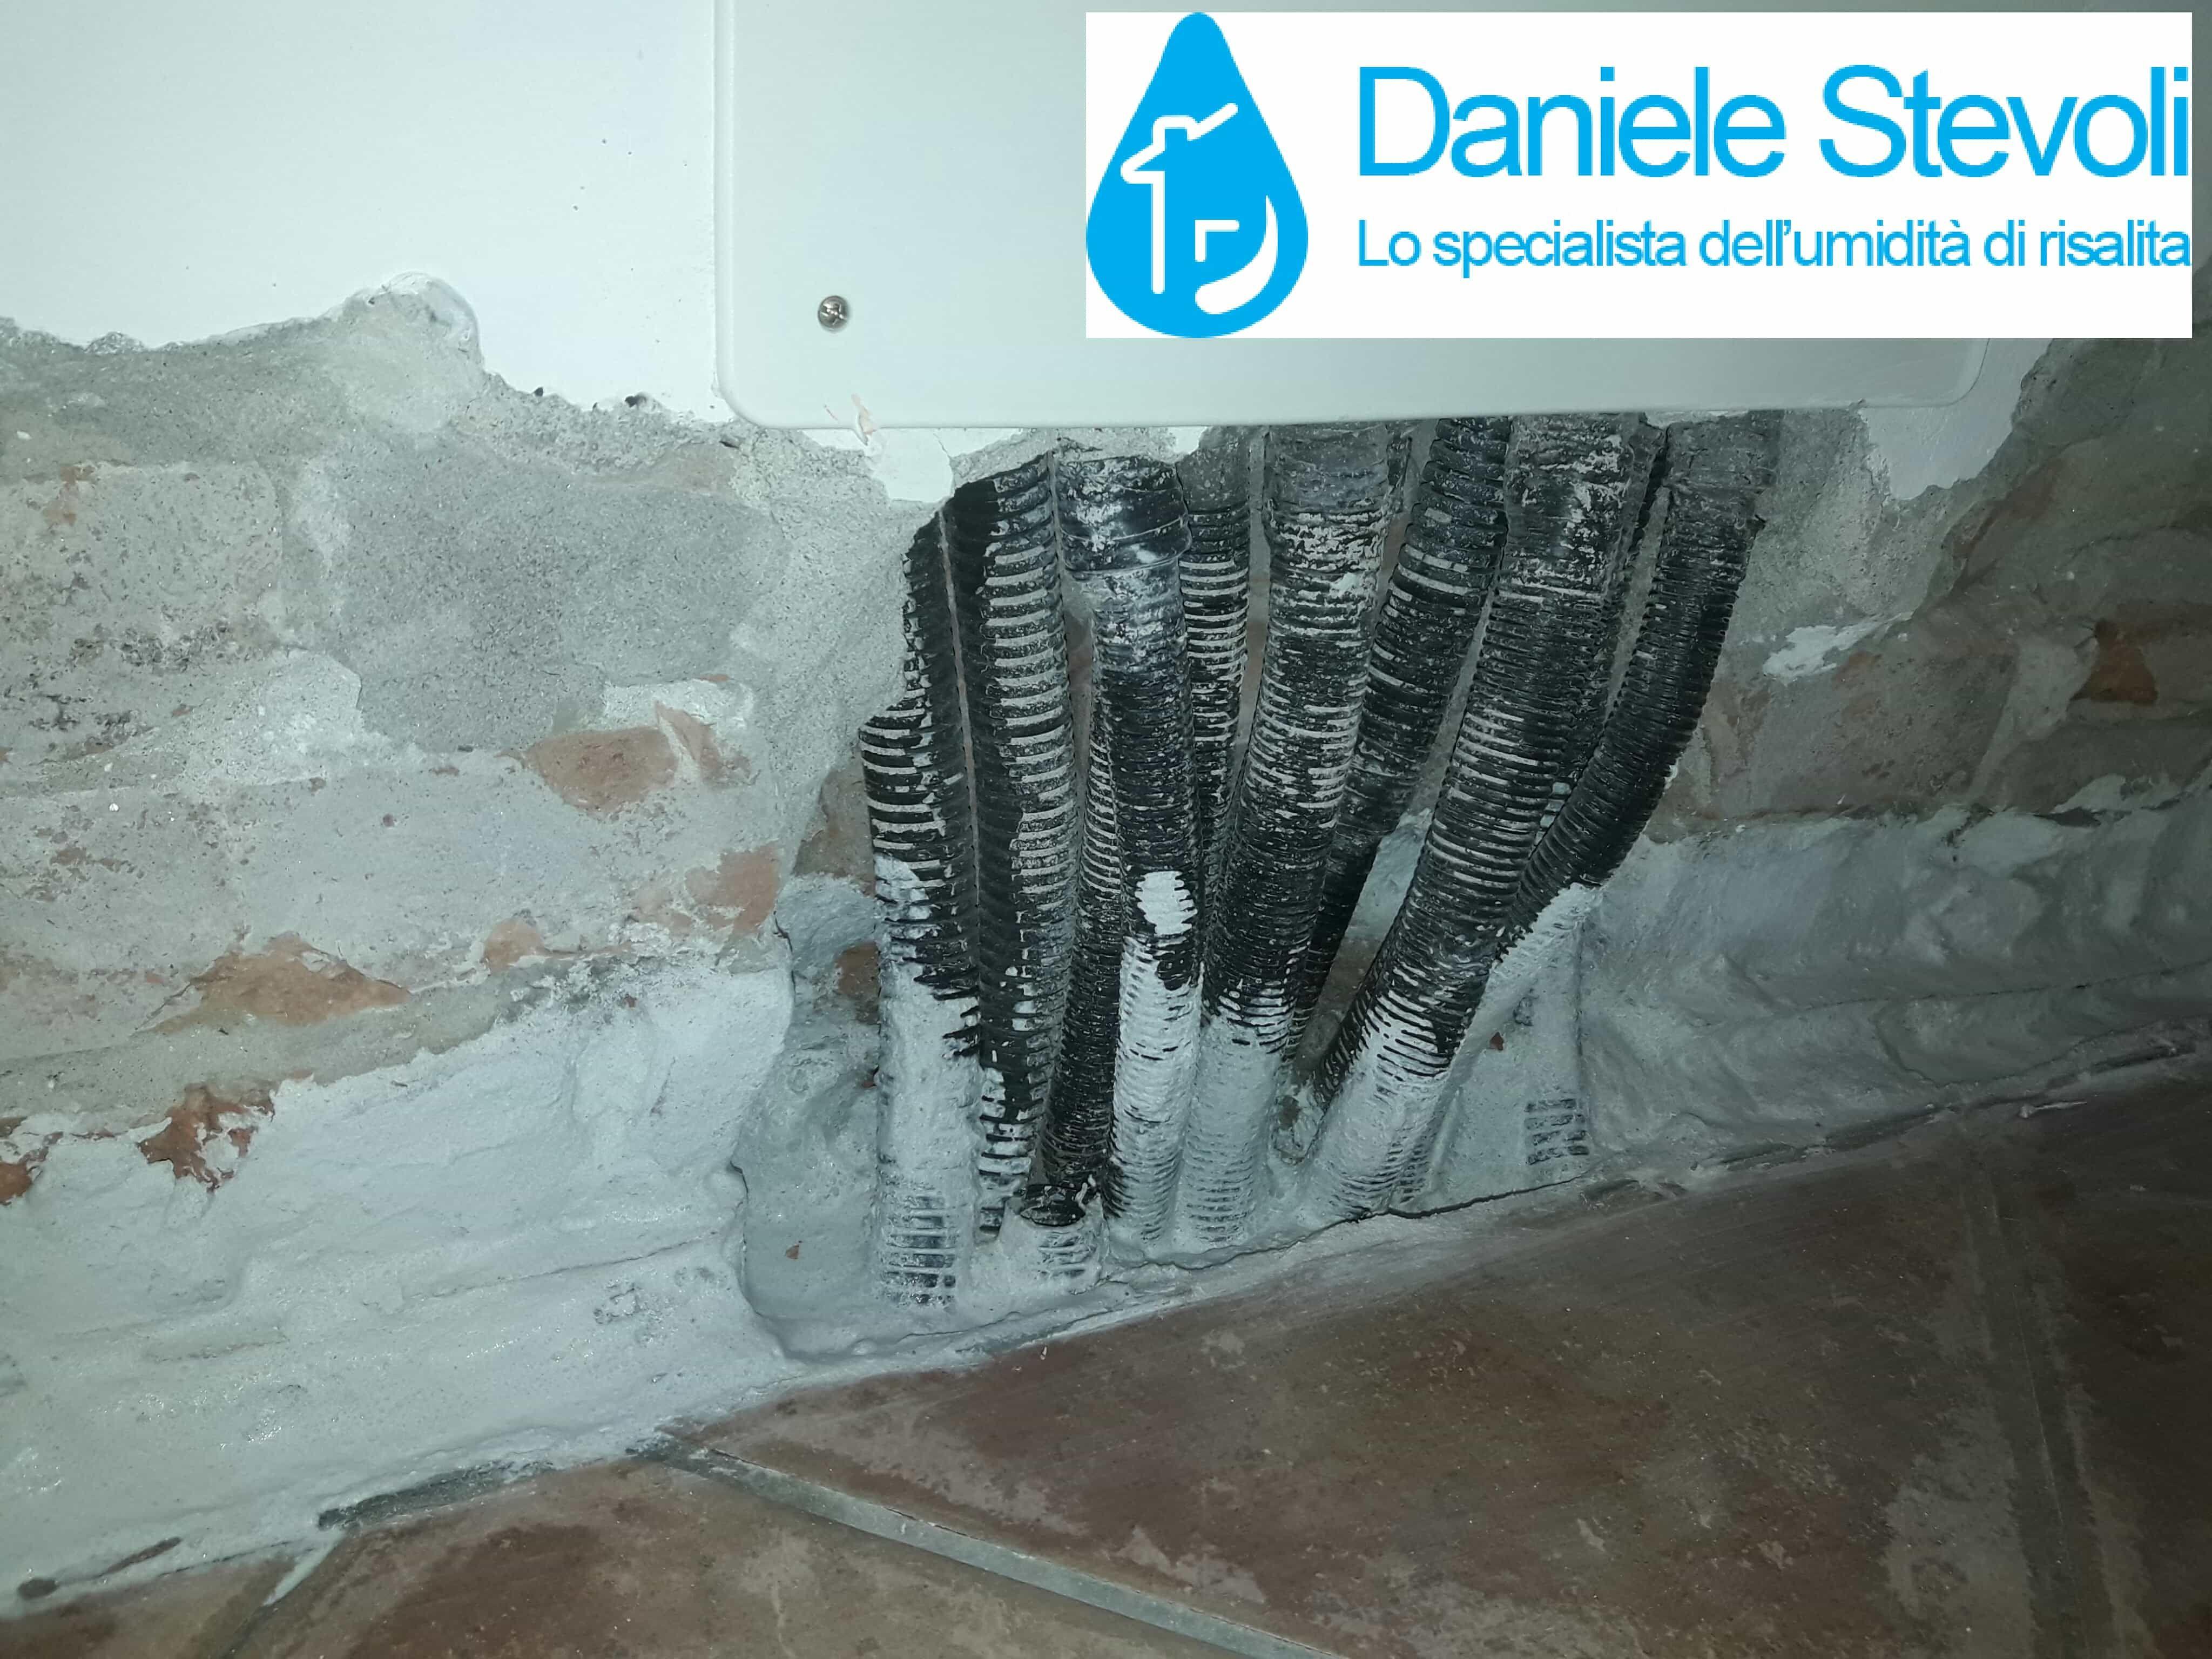 Scale Di Risalita Casa soluzioni definitive combinate all'umidità di risalita